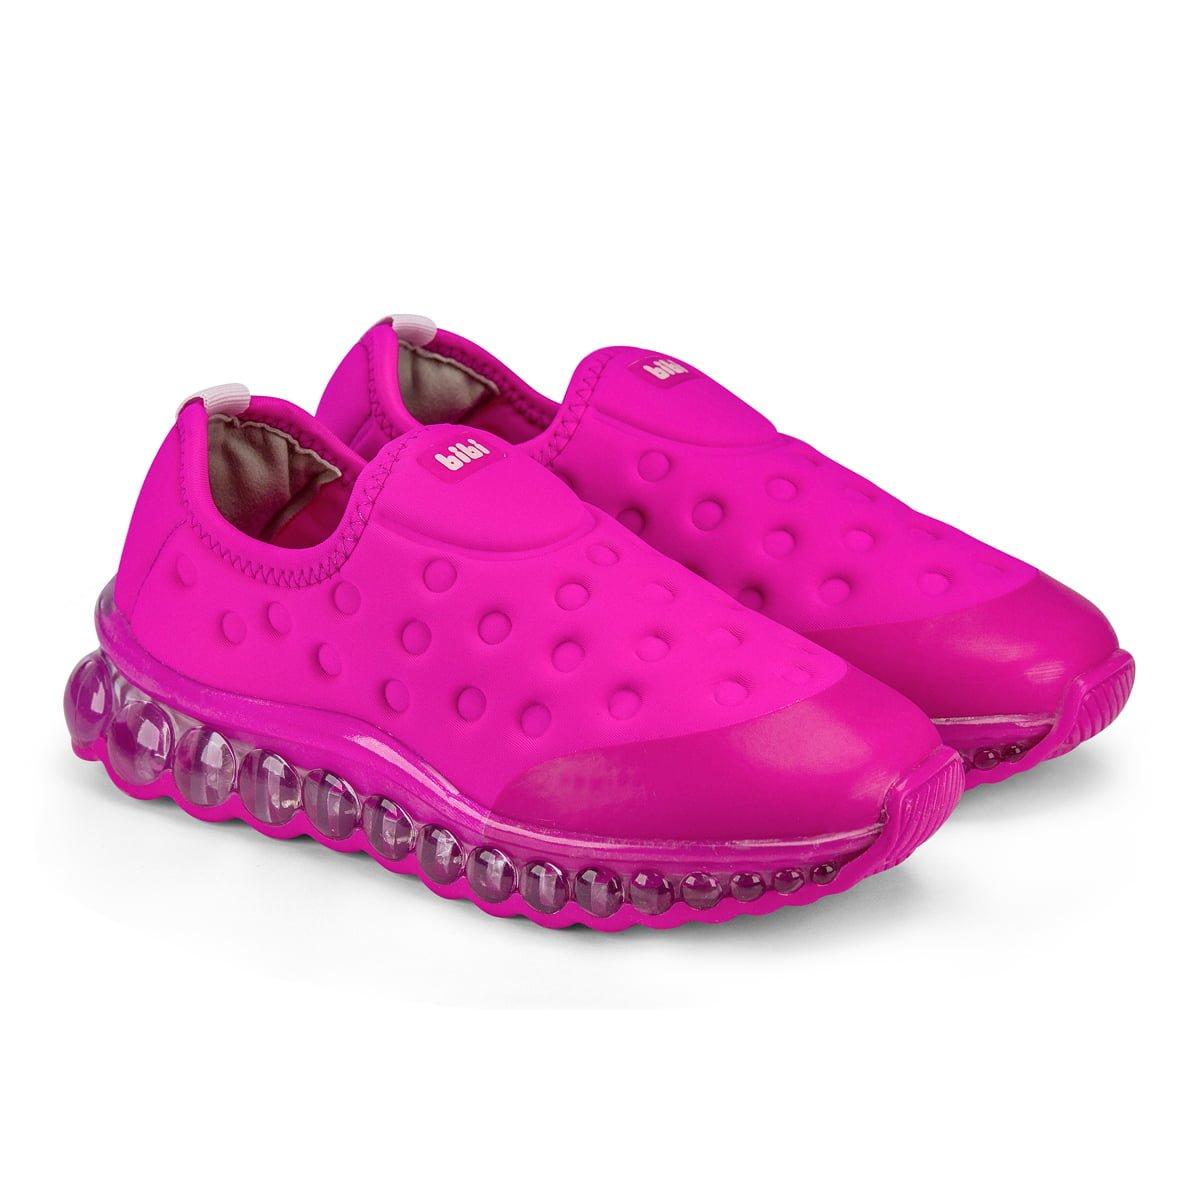 Pantofi sport Bibi Shoes Led Roller Celebration, Roz